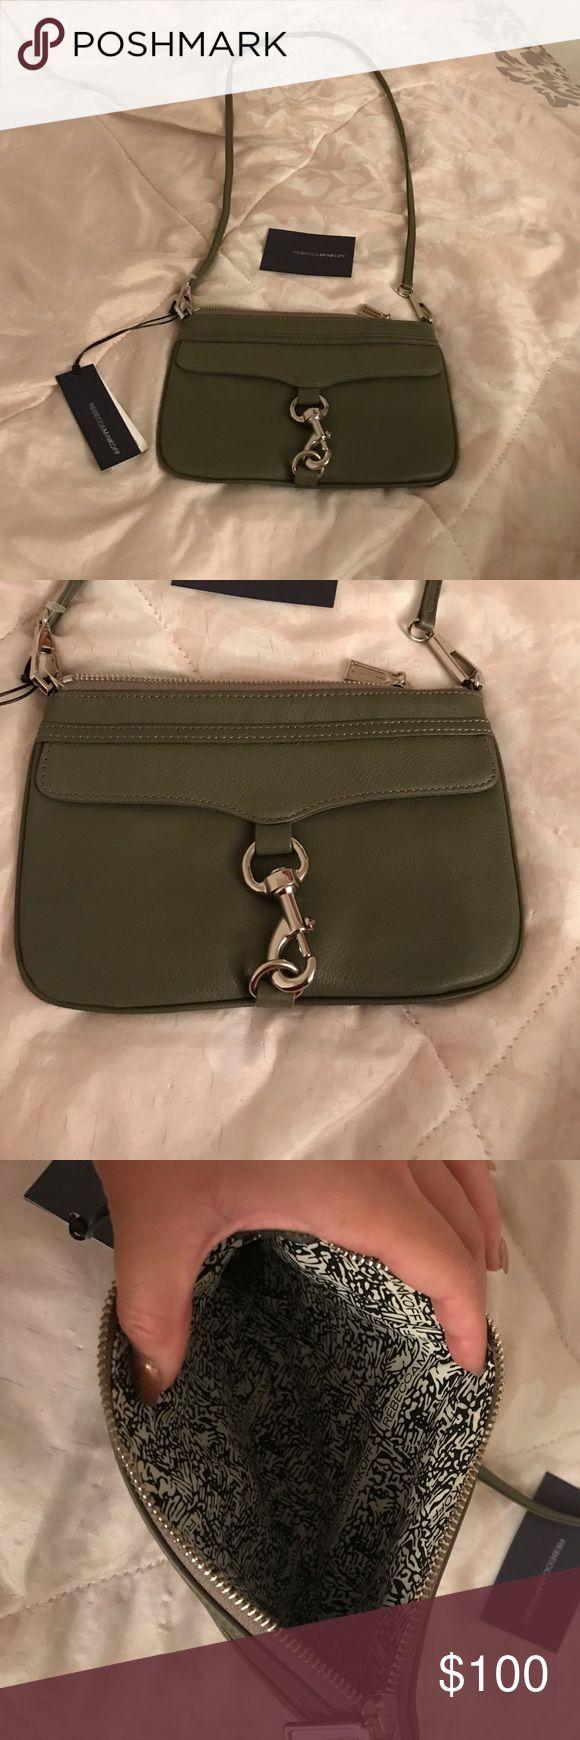 Rebecca minkoff purse New and cute it is a grey color Rebecca Minkoff Accessories